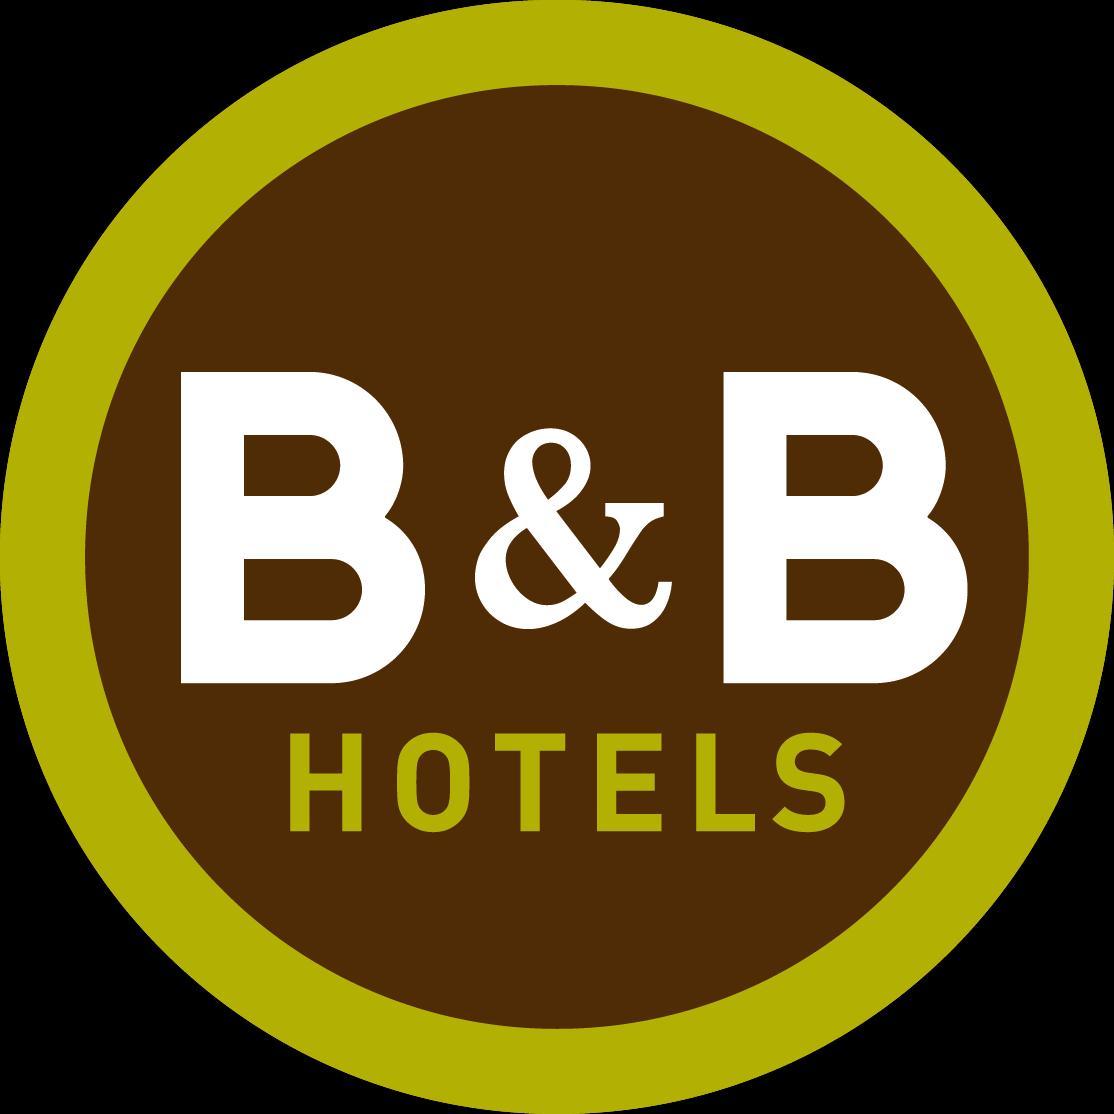 B&b Hotel Malakoff